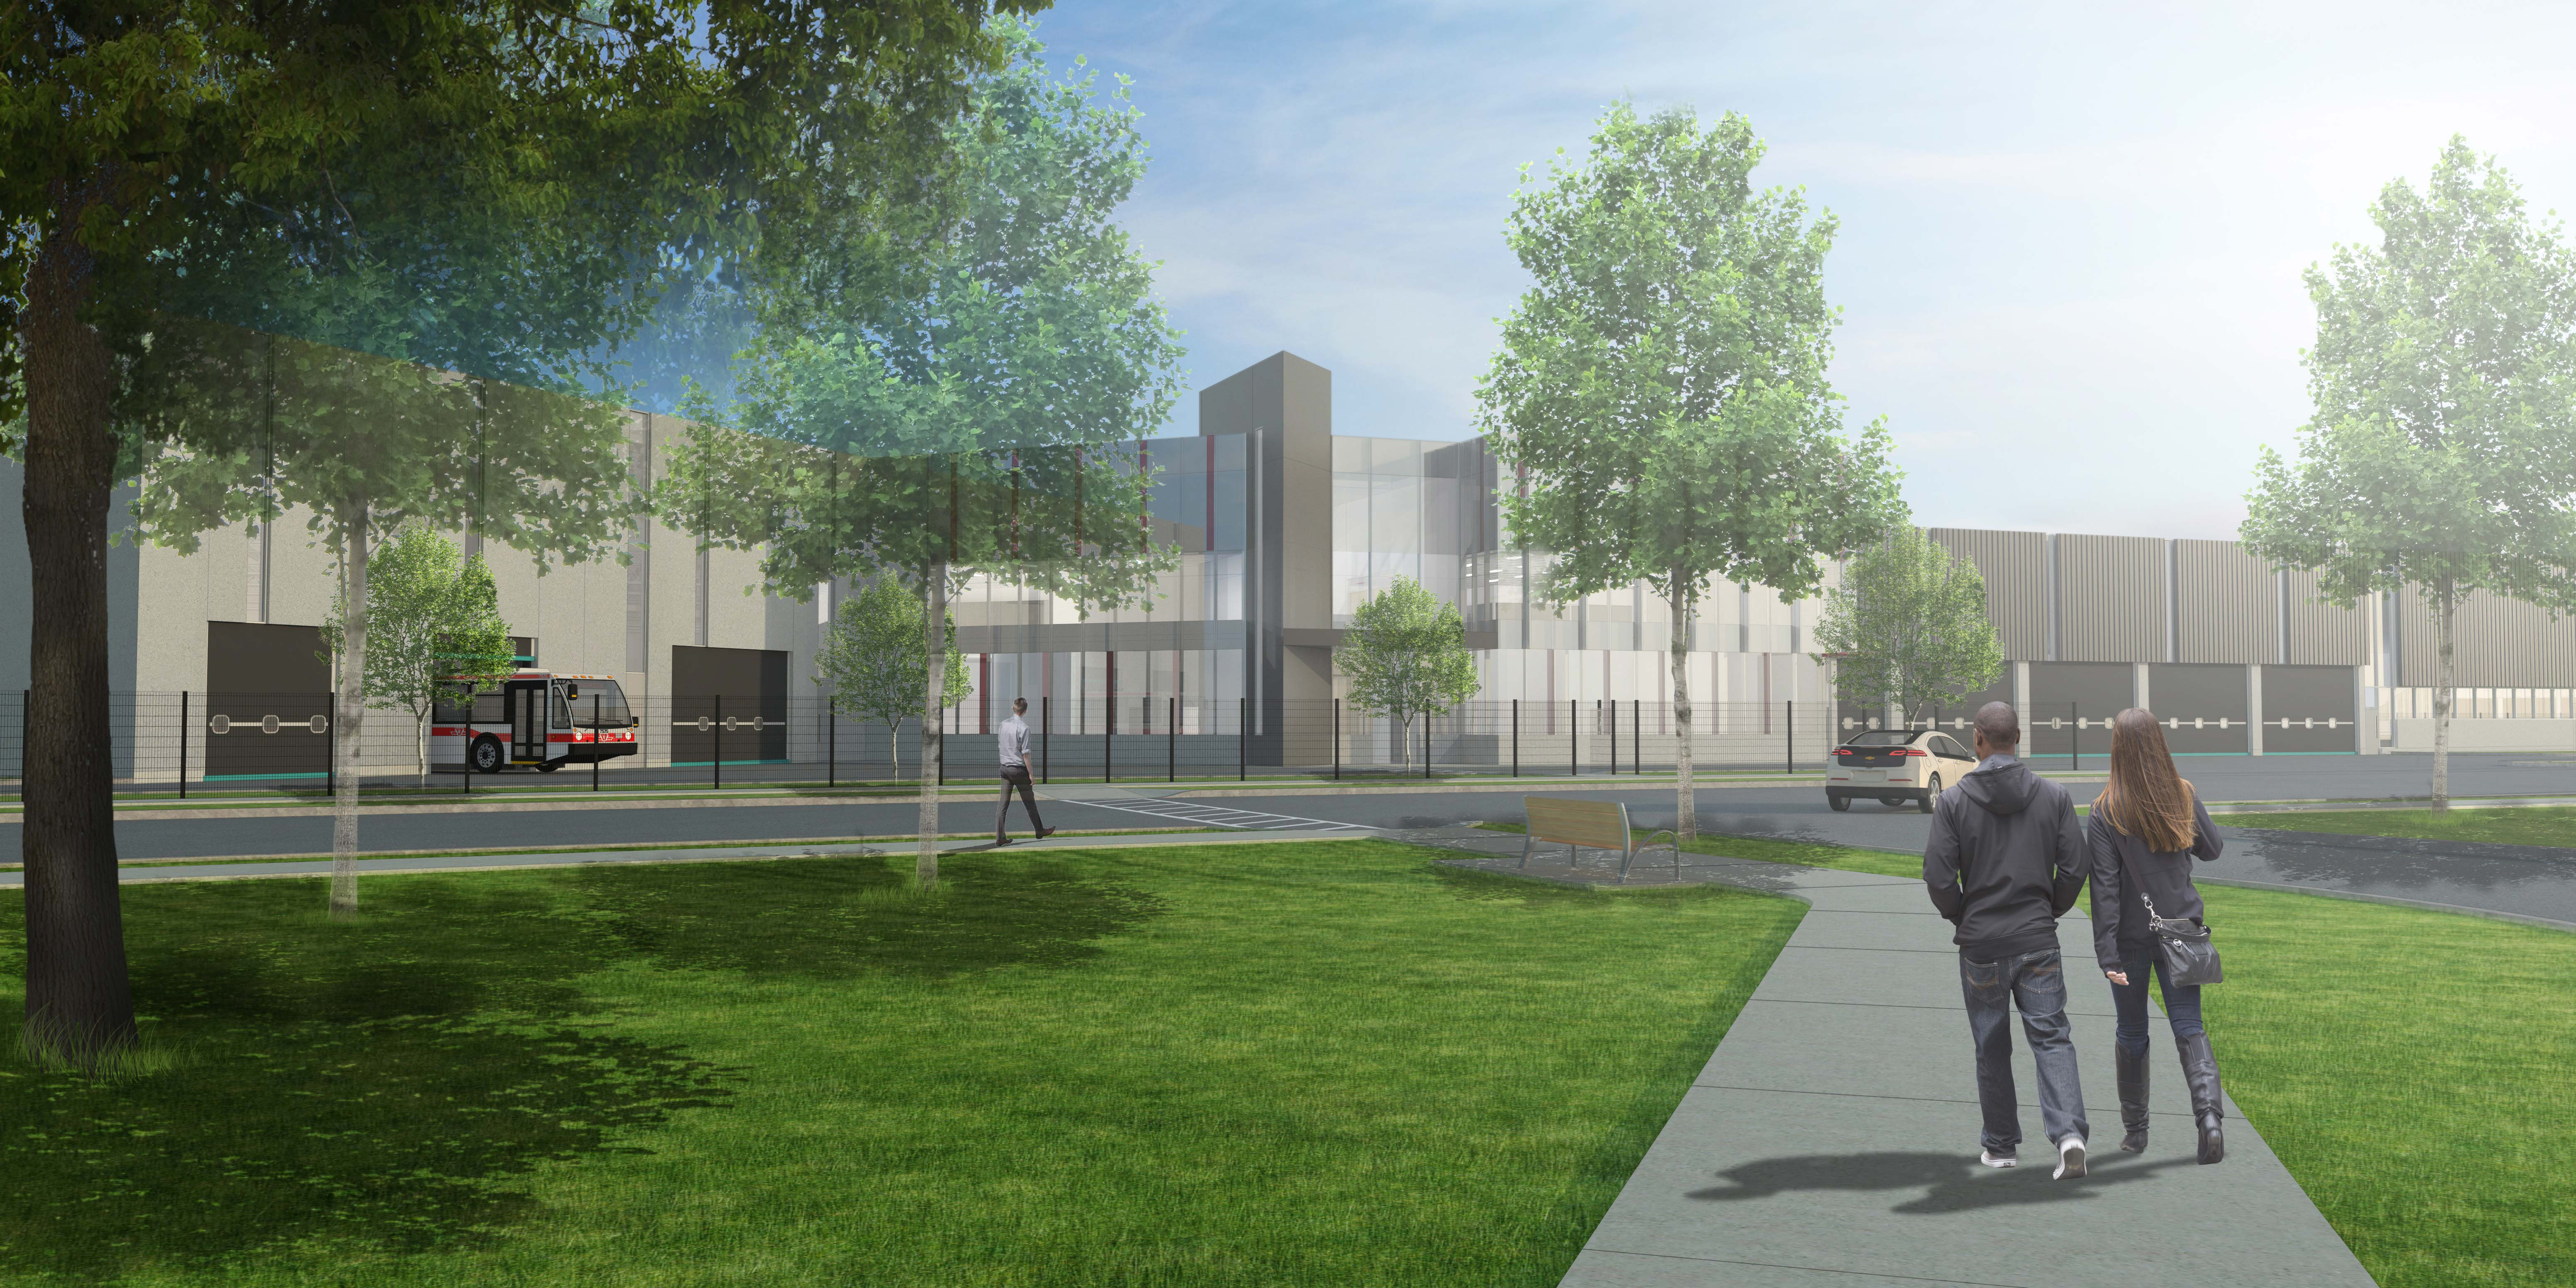 Ttc mcnicoll bus garage design build – strasman architects inc.